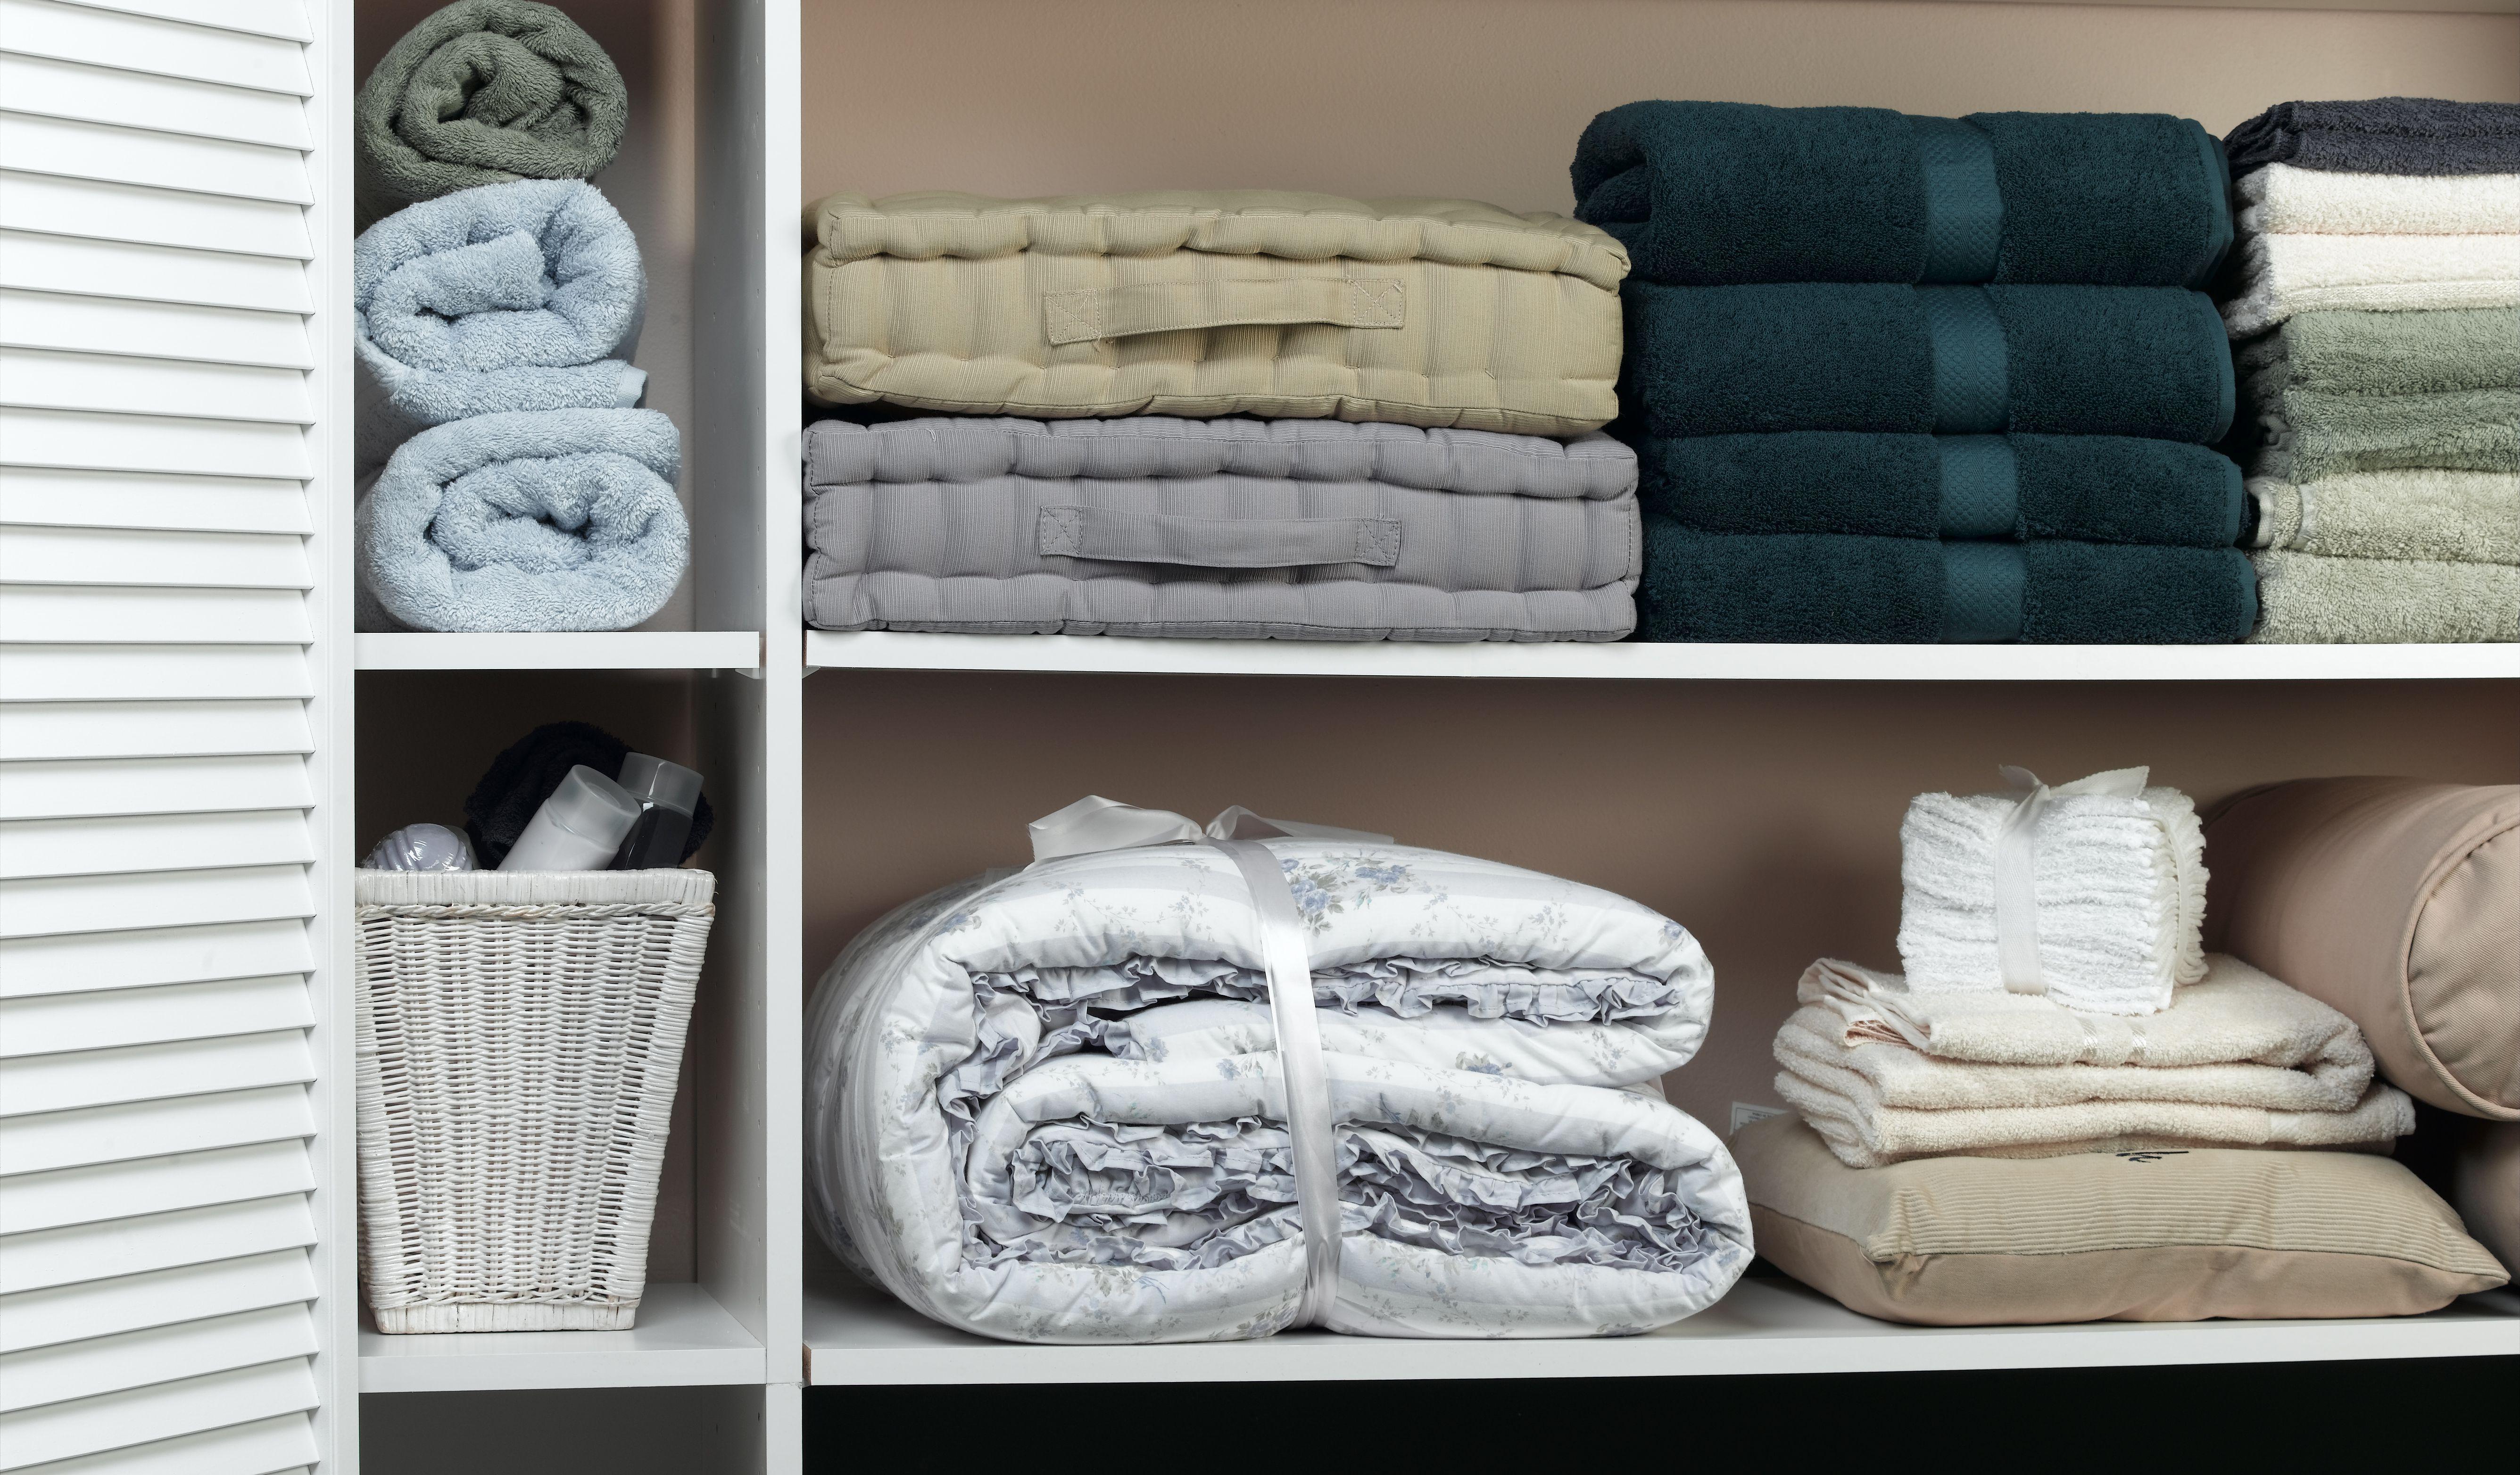 How To Wash An Electric Blanket Linen Closet Organization Linen